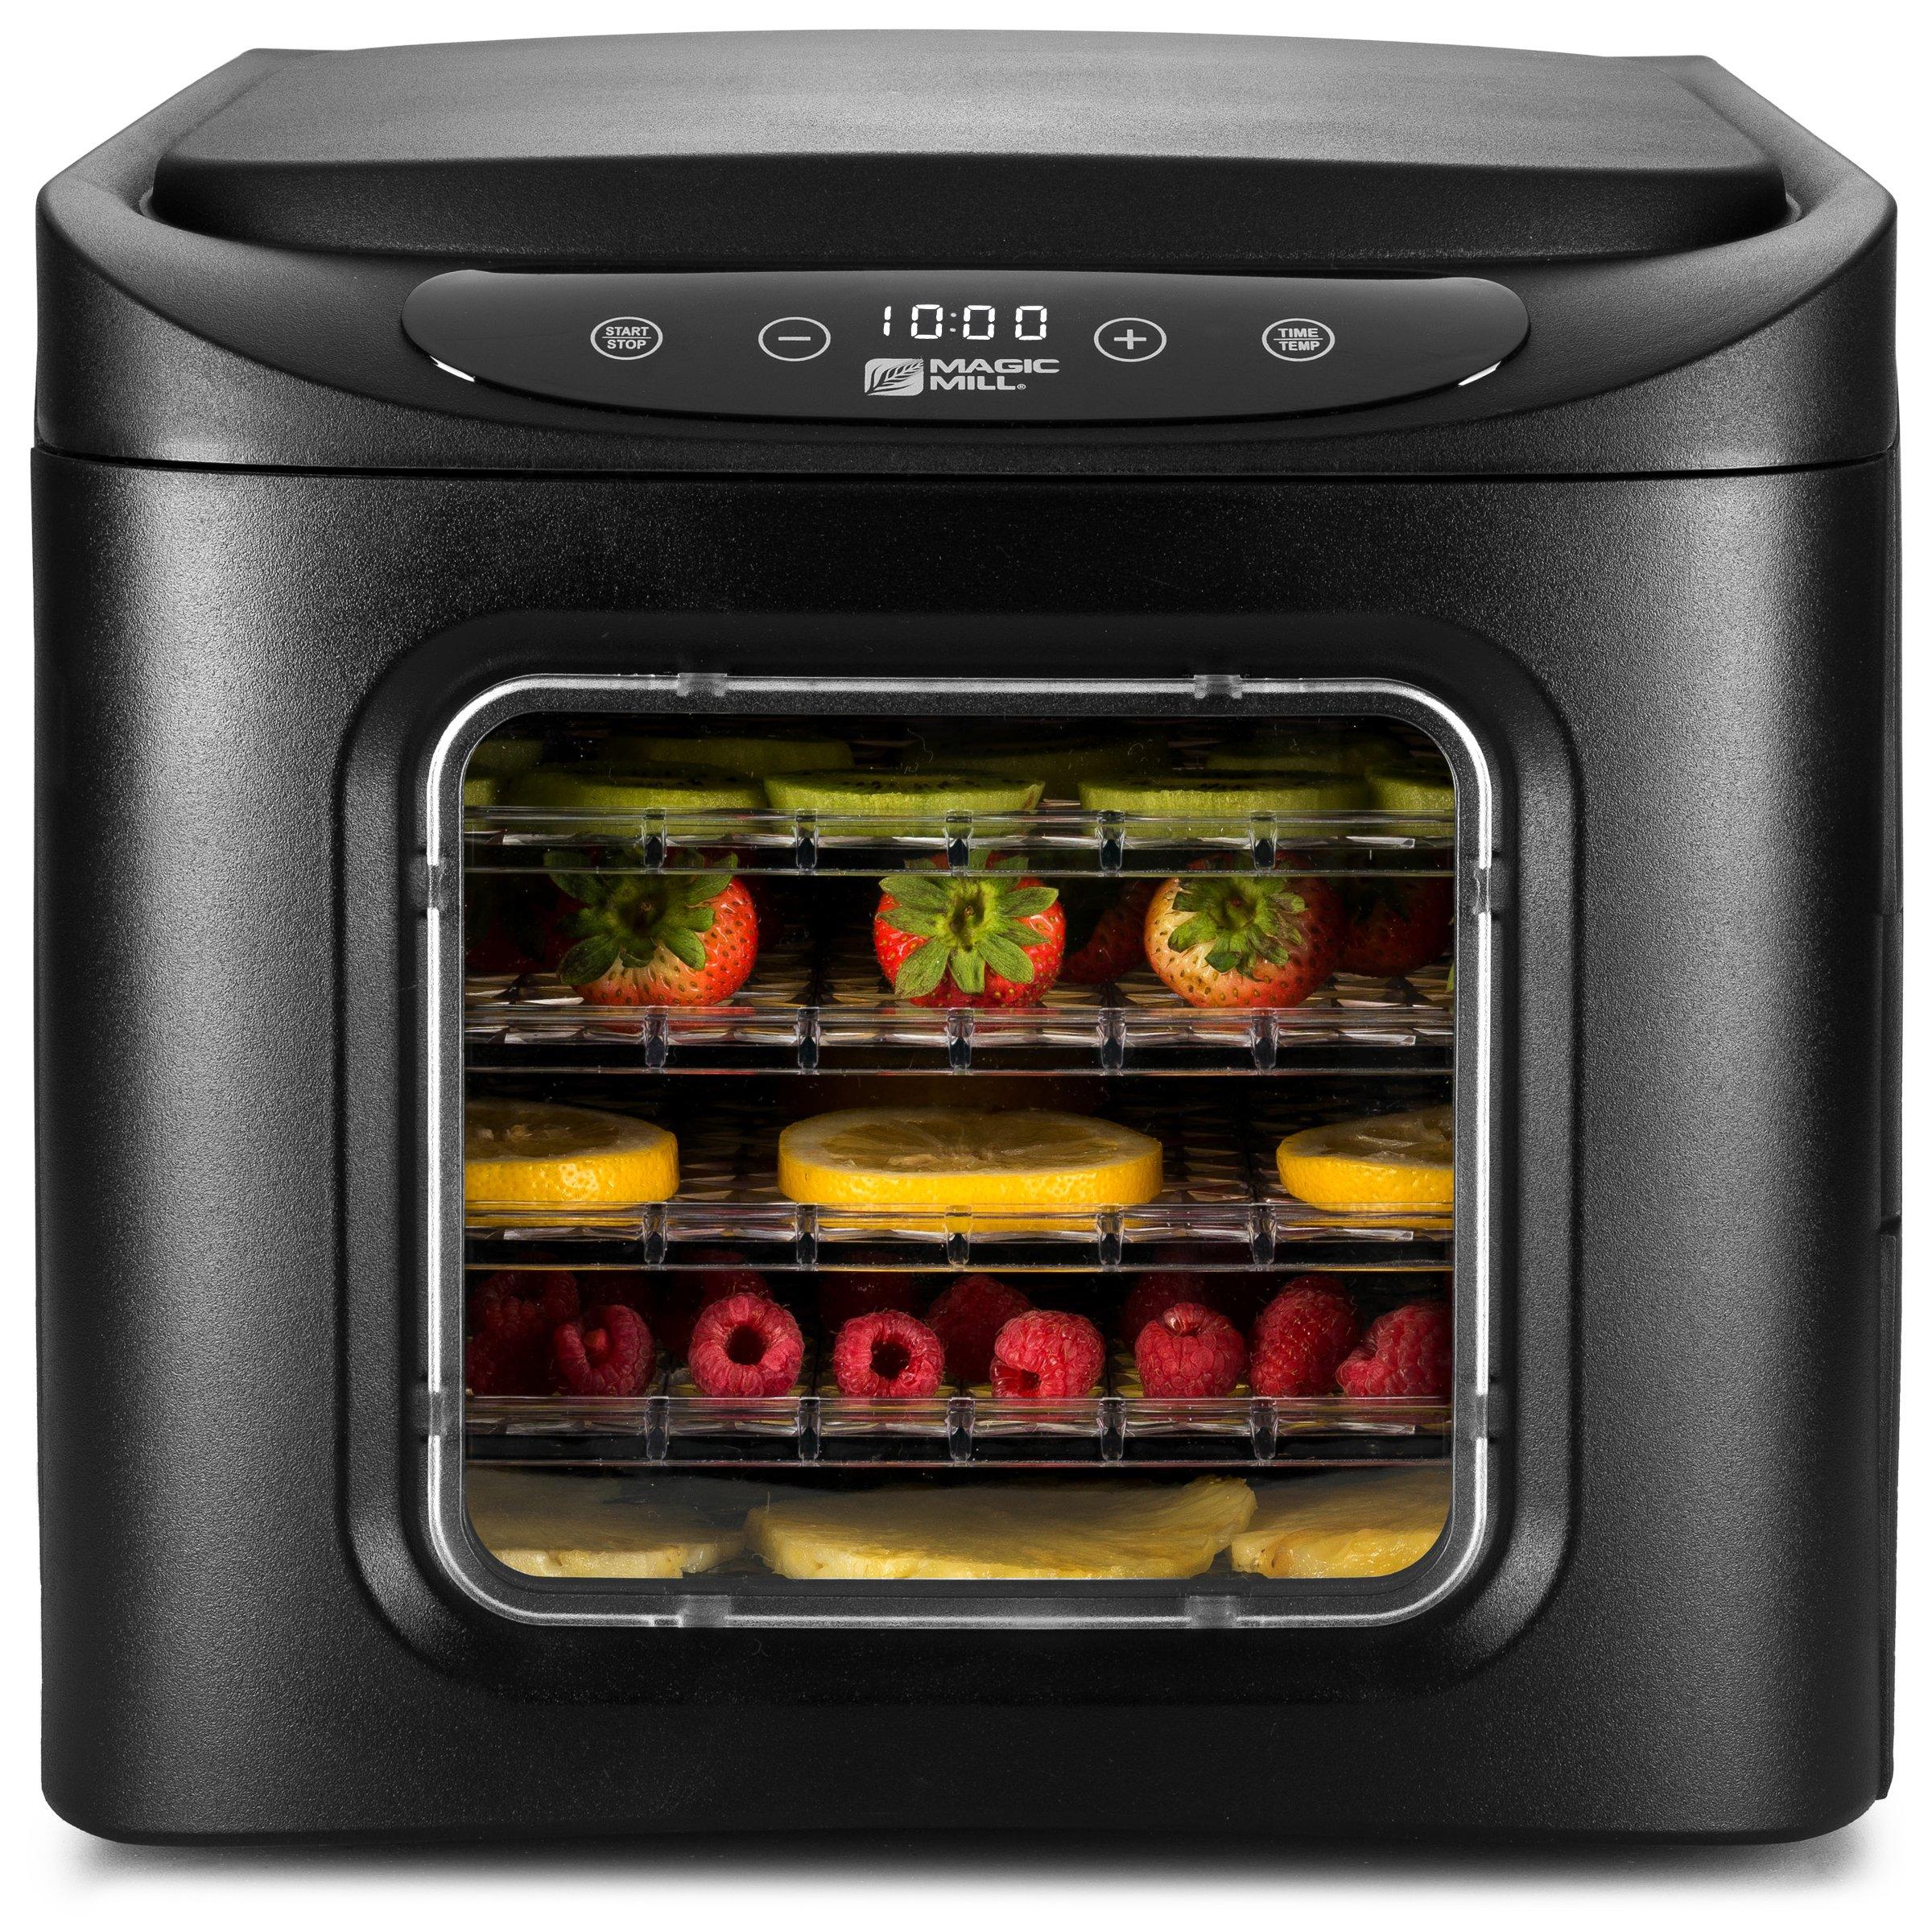 MAGIC MILL Professional Food Dehydrator Machine, 6 Drying Racks, Multi-Tier Food Preserver, Digital Control 2 Fruit Leather Trays, 2 Fine Mesh Sheets,